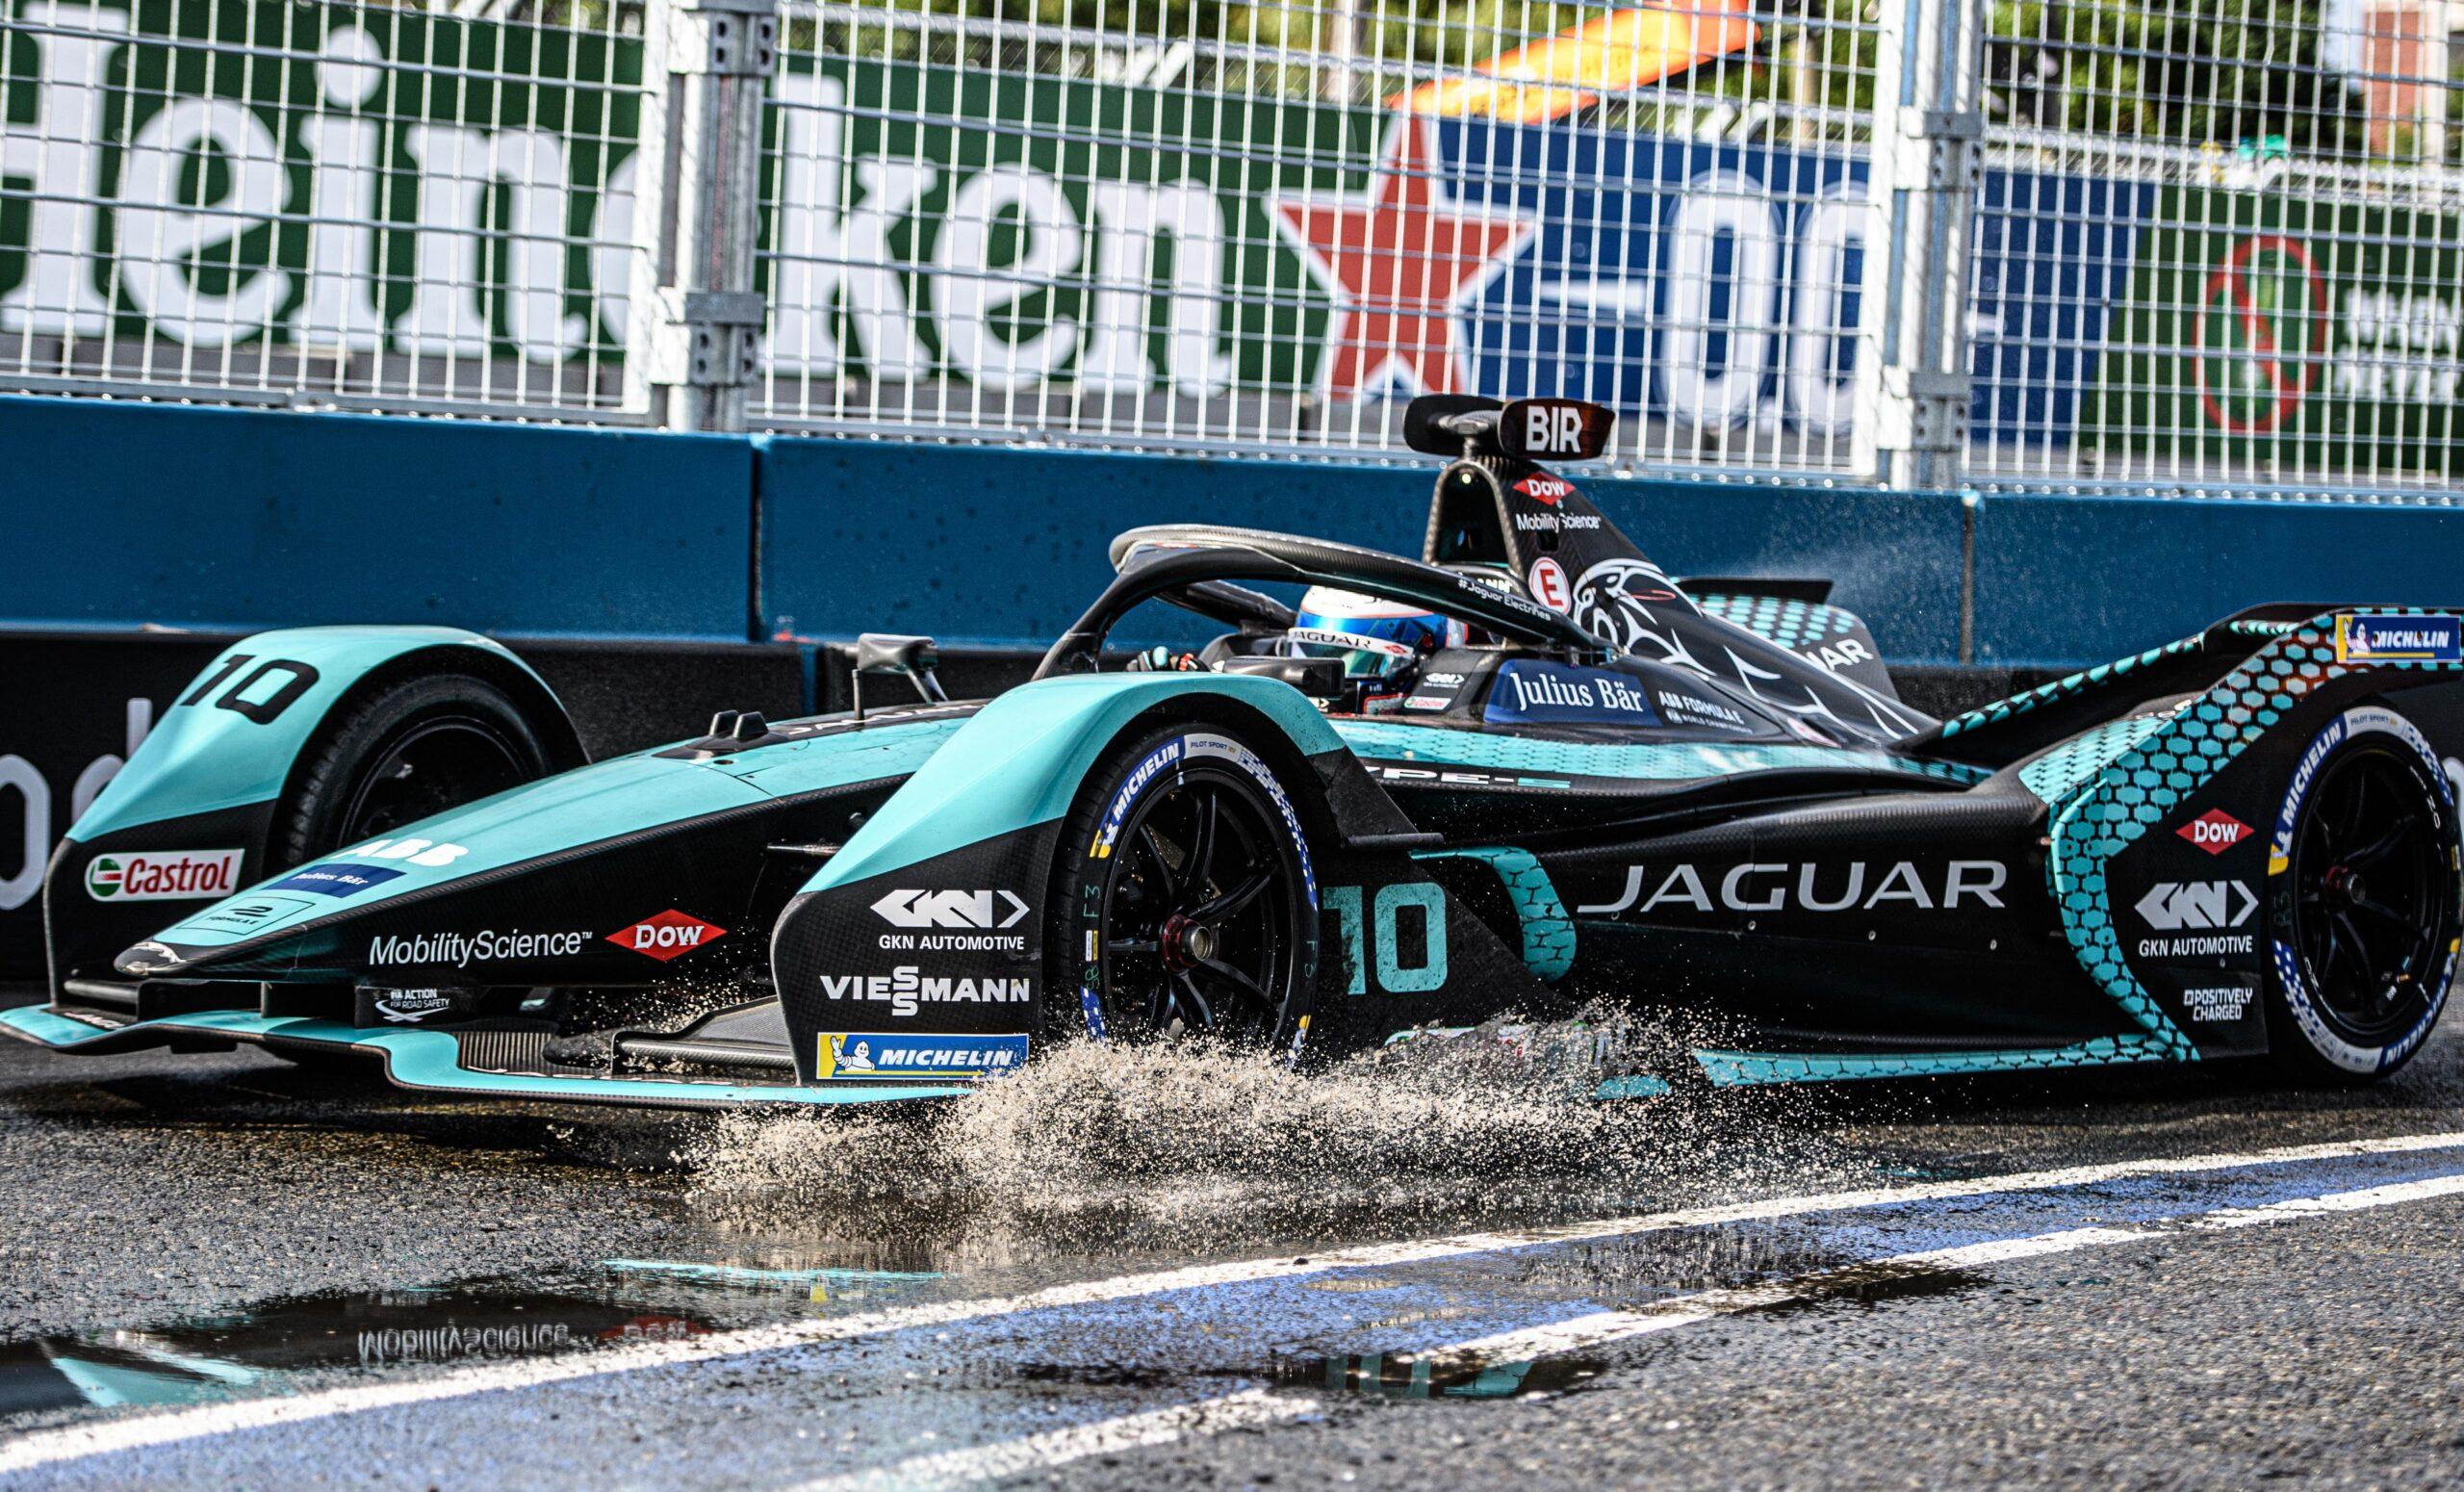 Jaguar Racing continua la sua avventura in Formula E con la Gen3